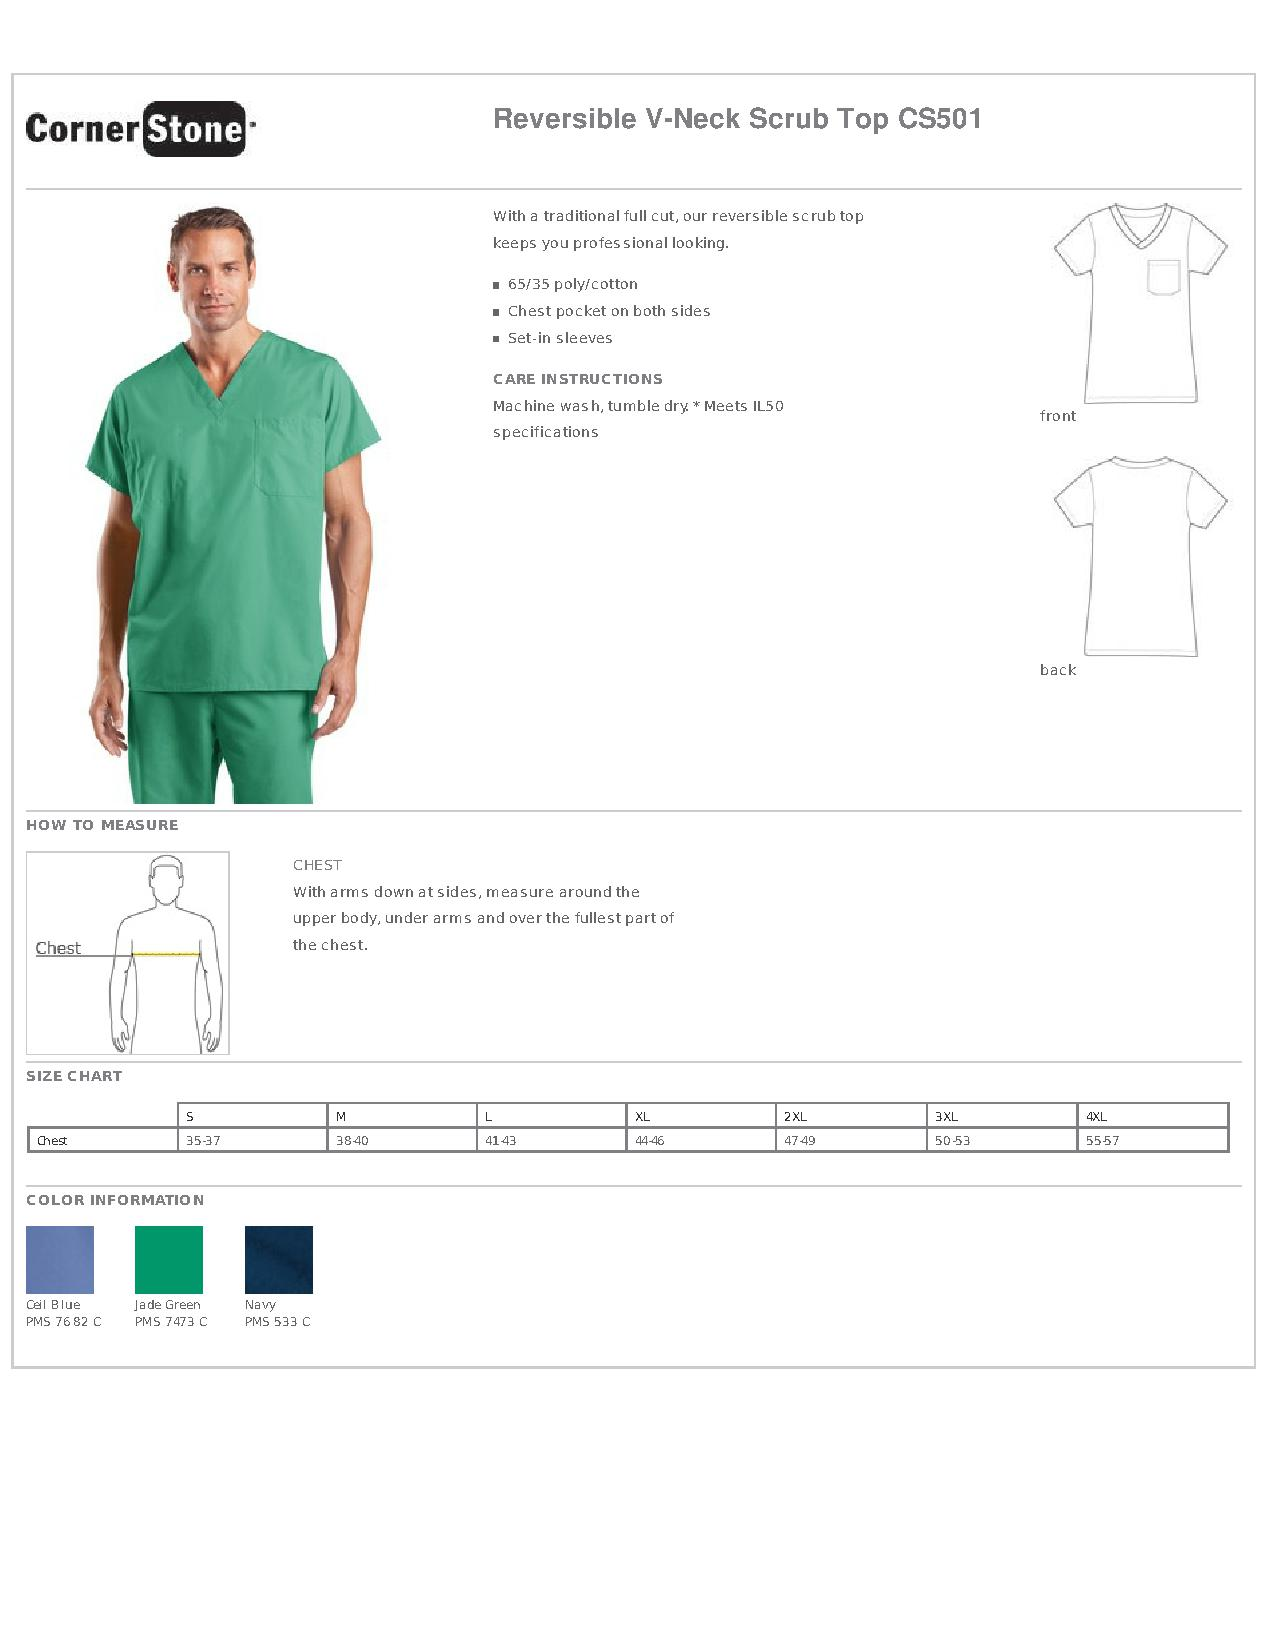 add71affae3 CornerStone® CS501 Reversible V-Neck Scrub Top - Work Shirts